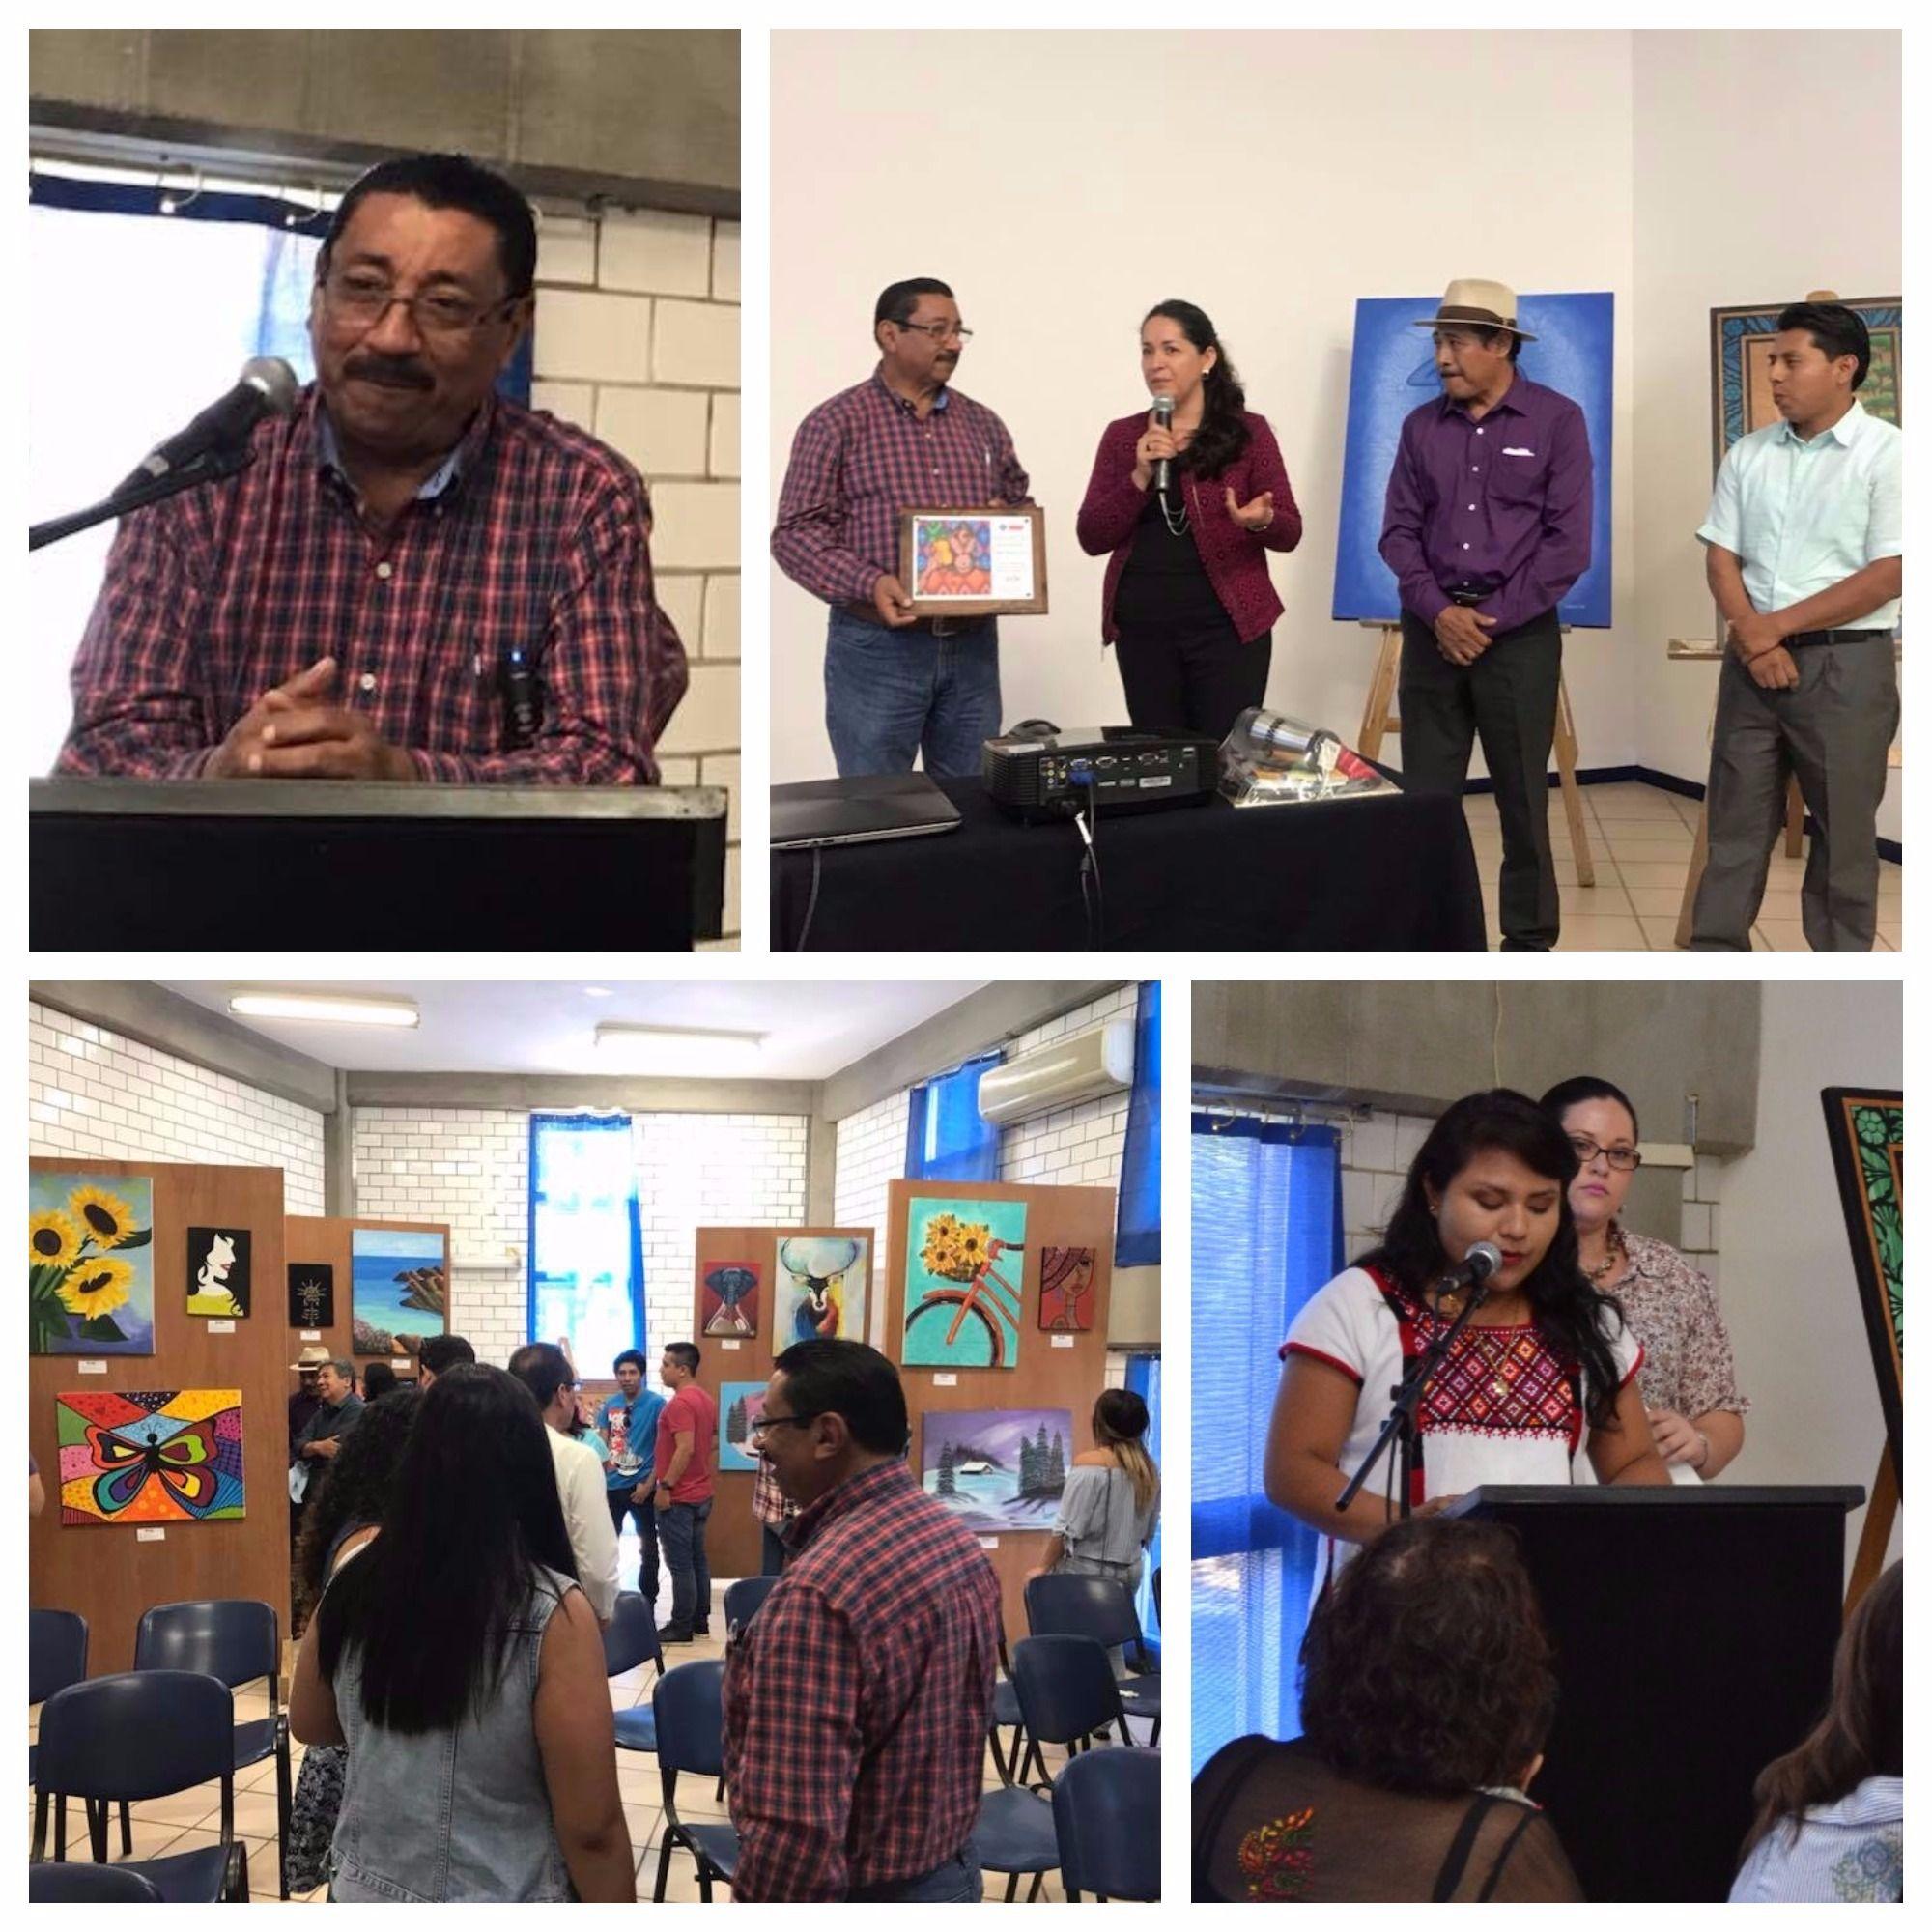 UMAD Papaloapan rinde Homenaje al pintor costumbrista Pedro Alvizar